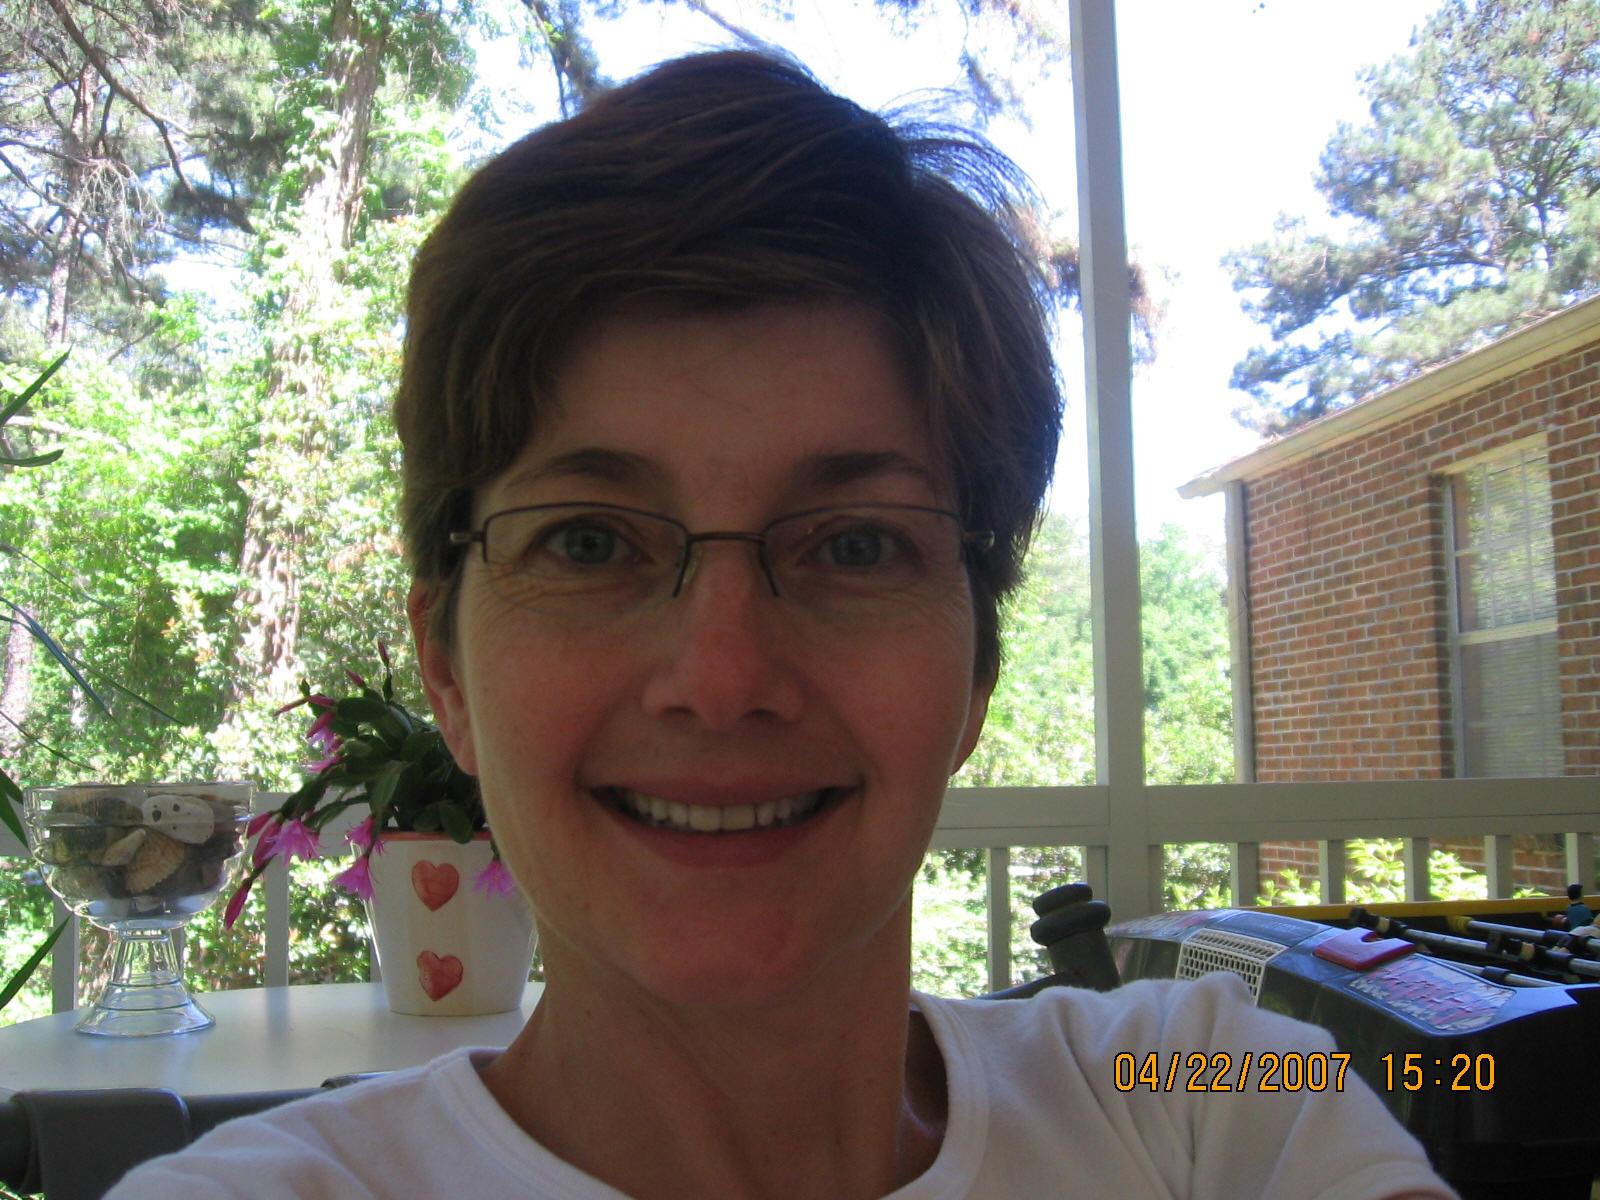 April 22, 2007, 8 months after surgery